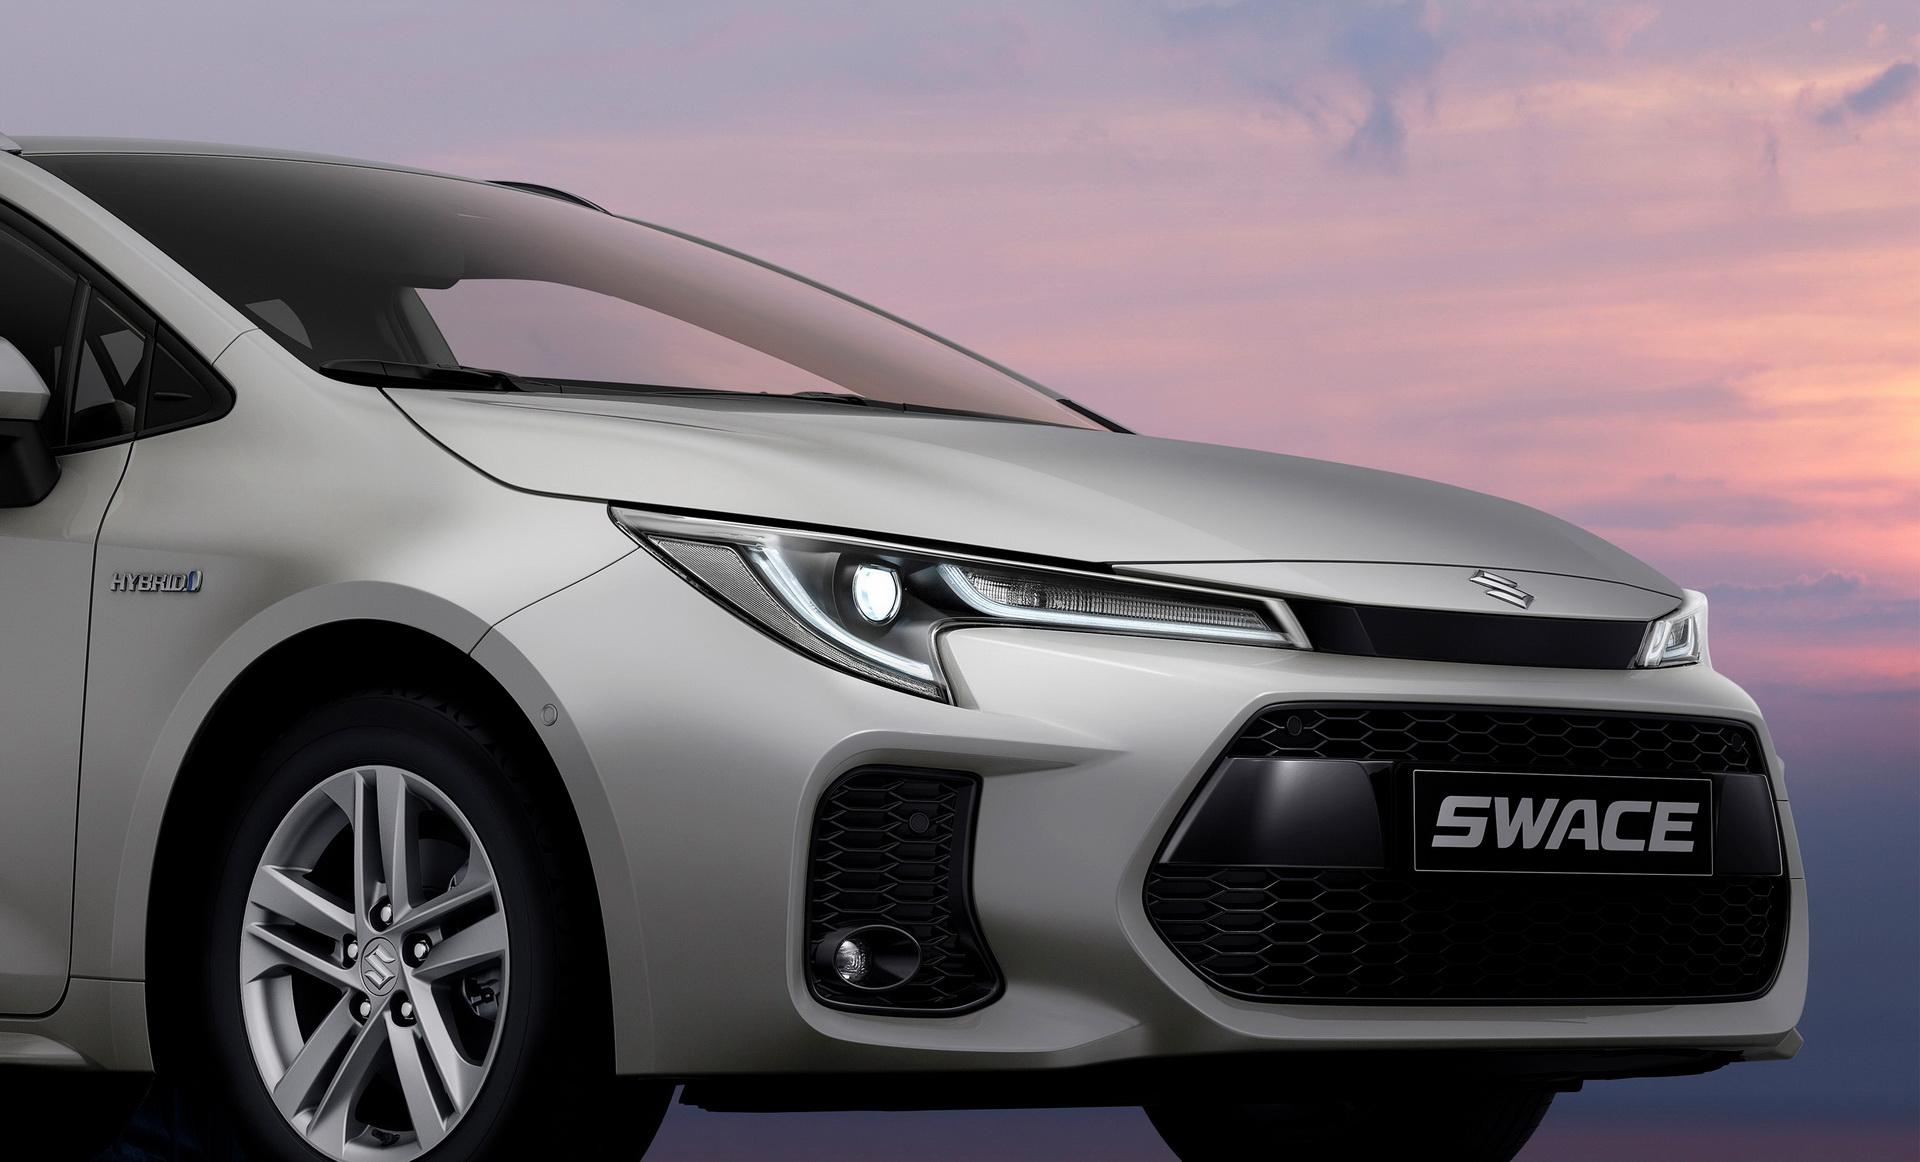 Suzuki-Swace-03